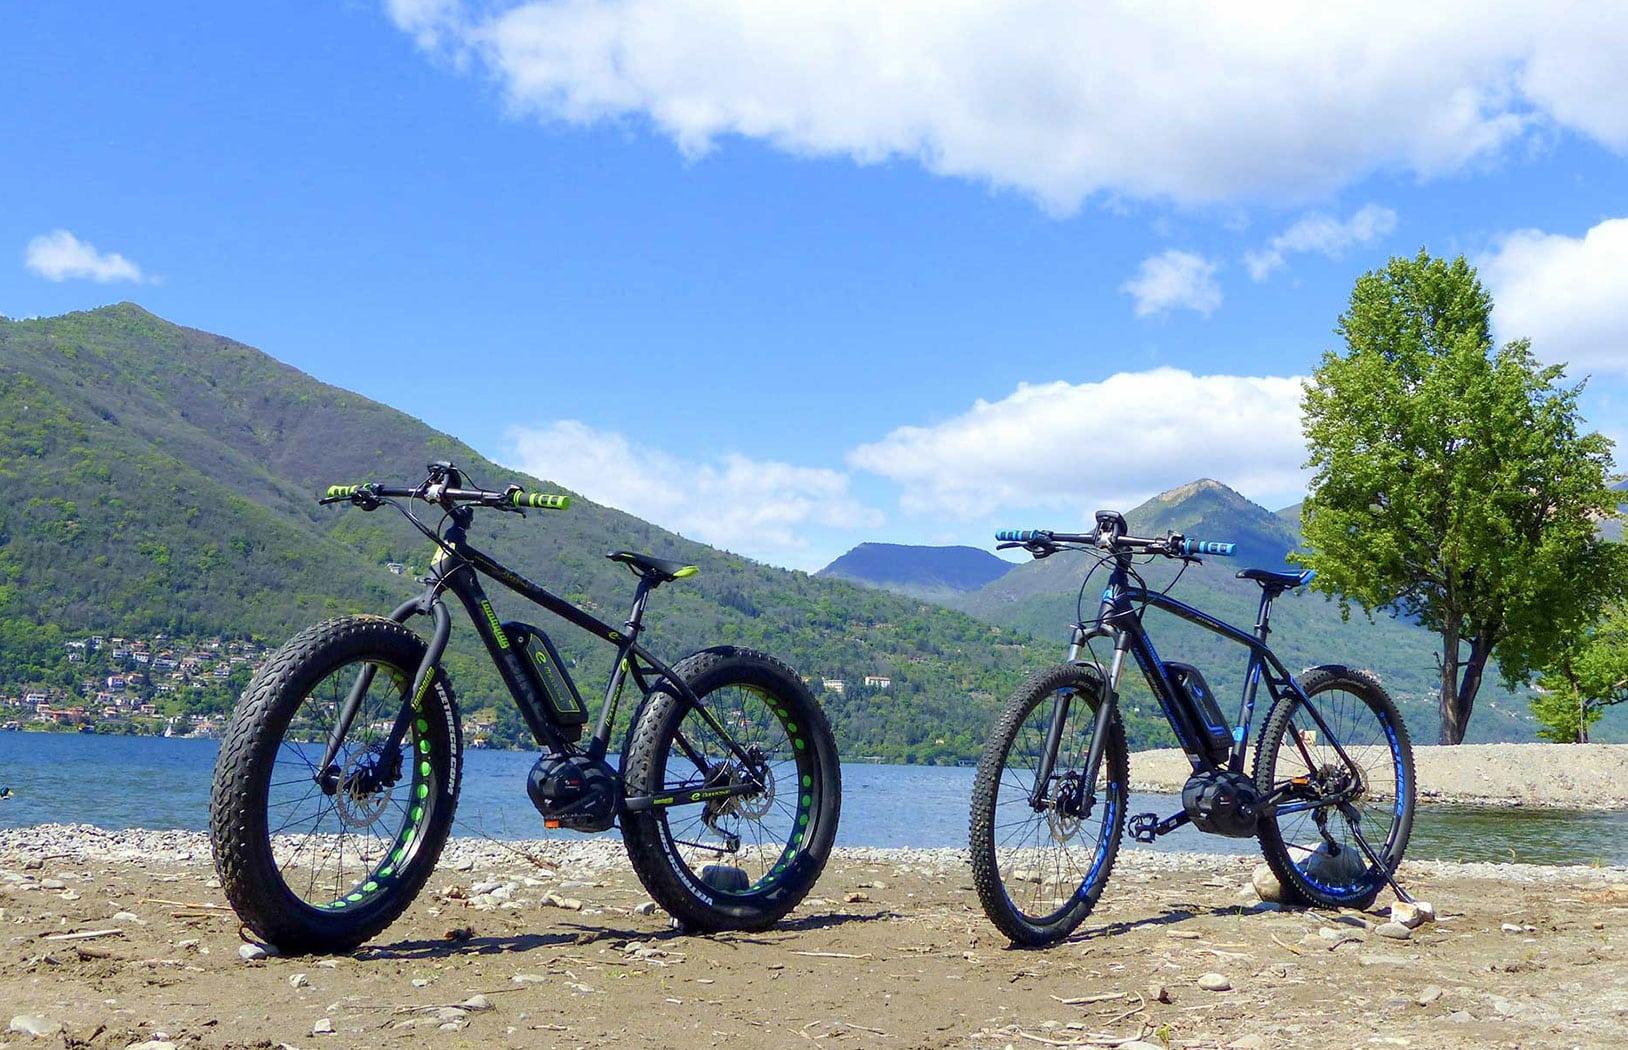 Fahrradfahren rund um den Lago Maggiore